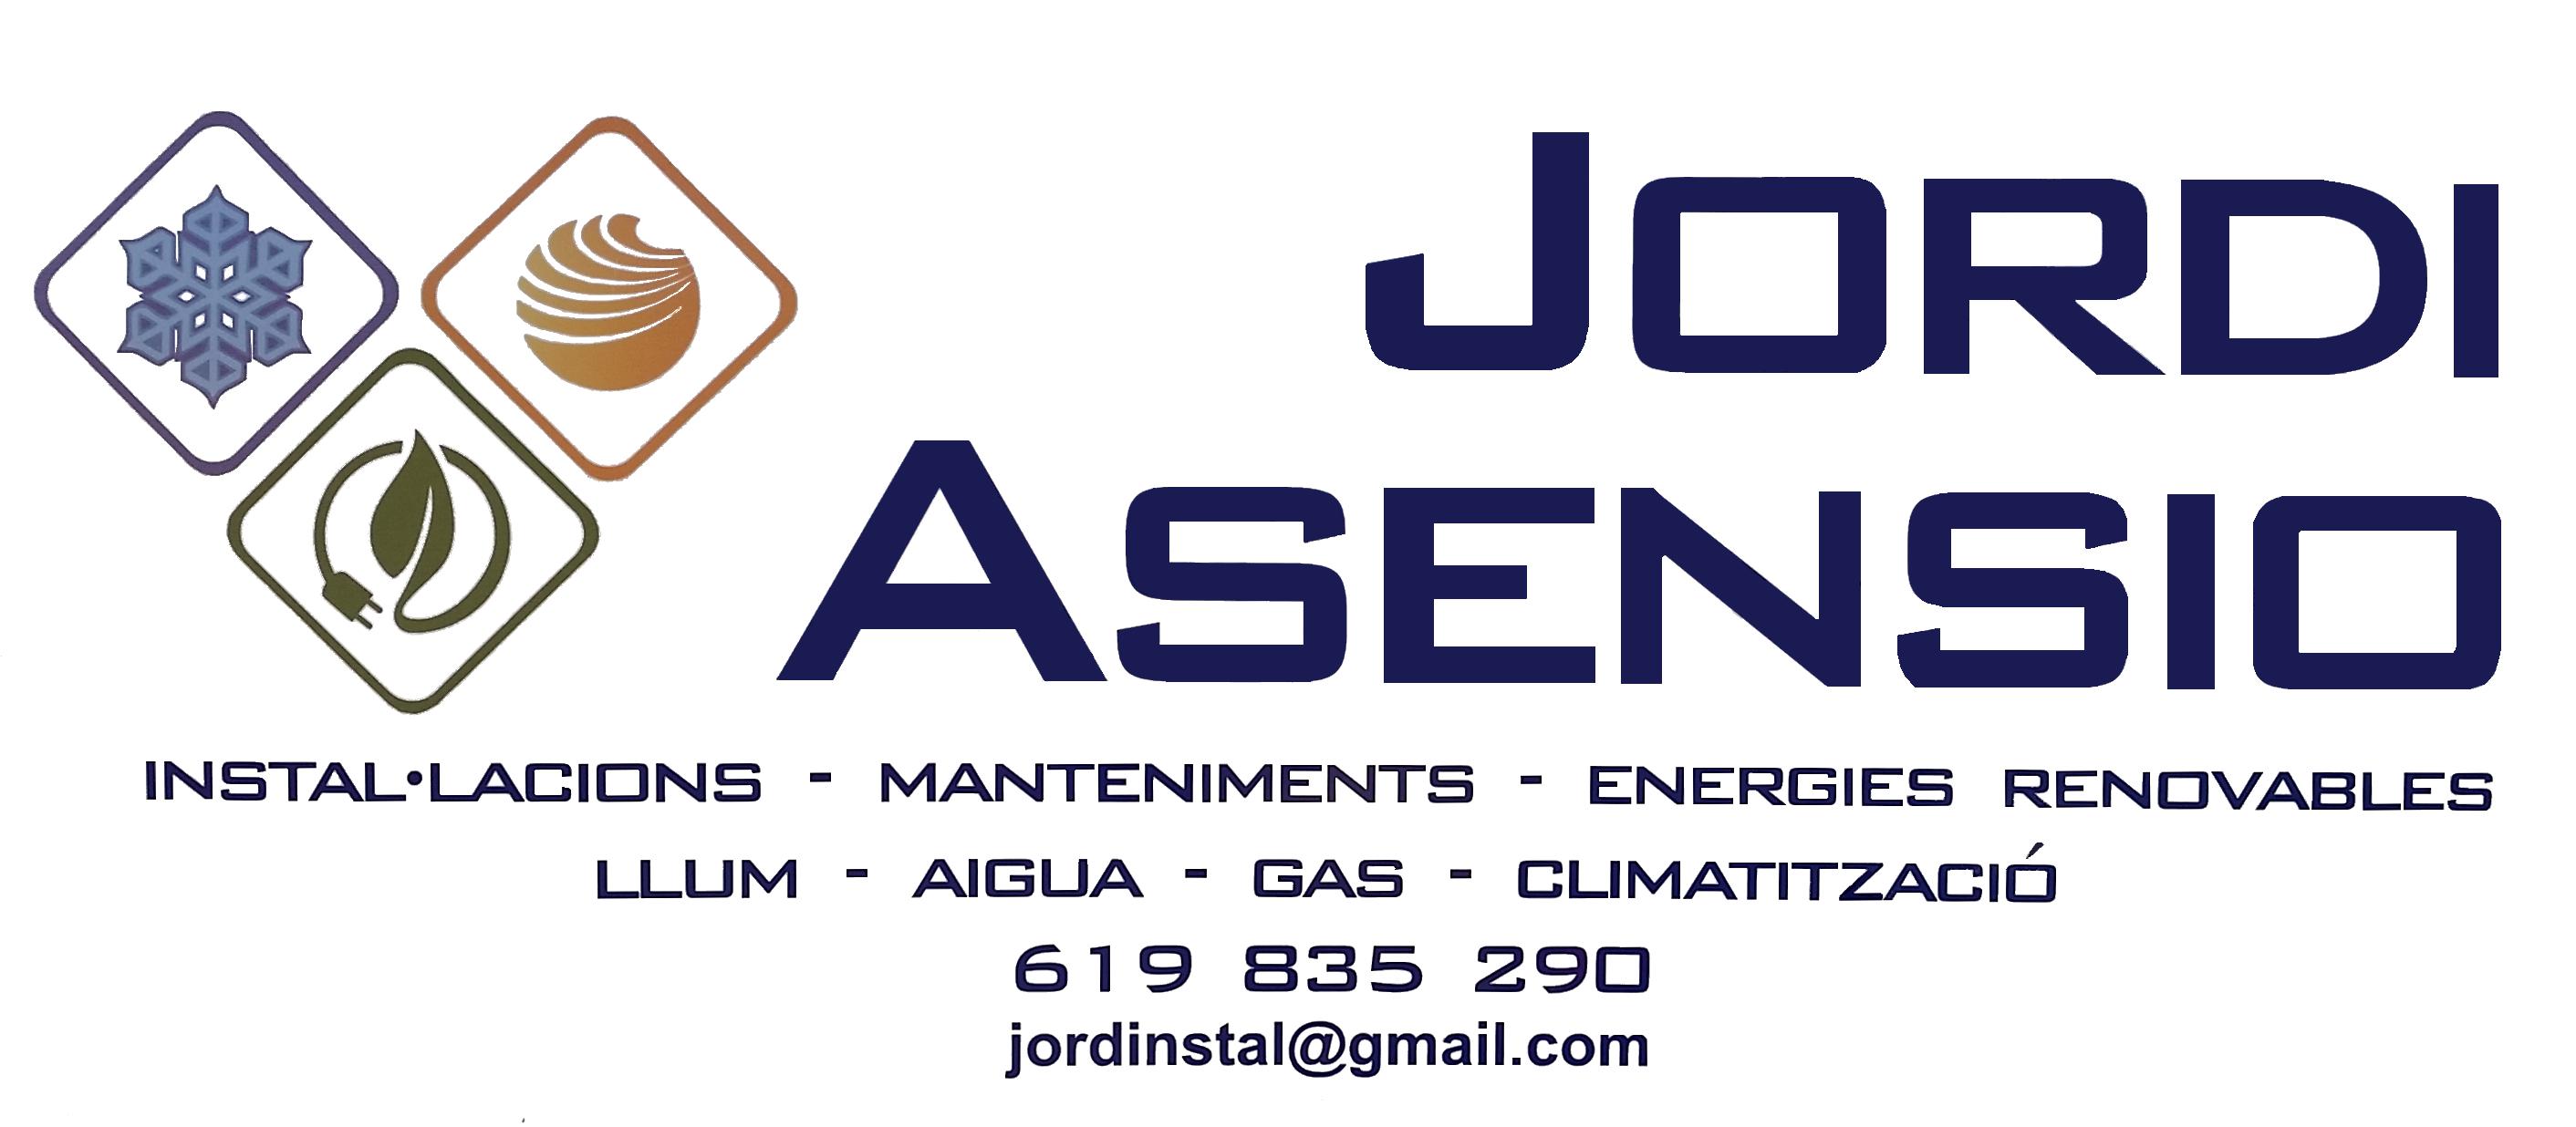 Jordi Asensio